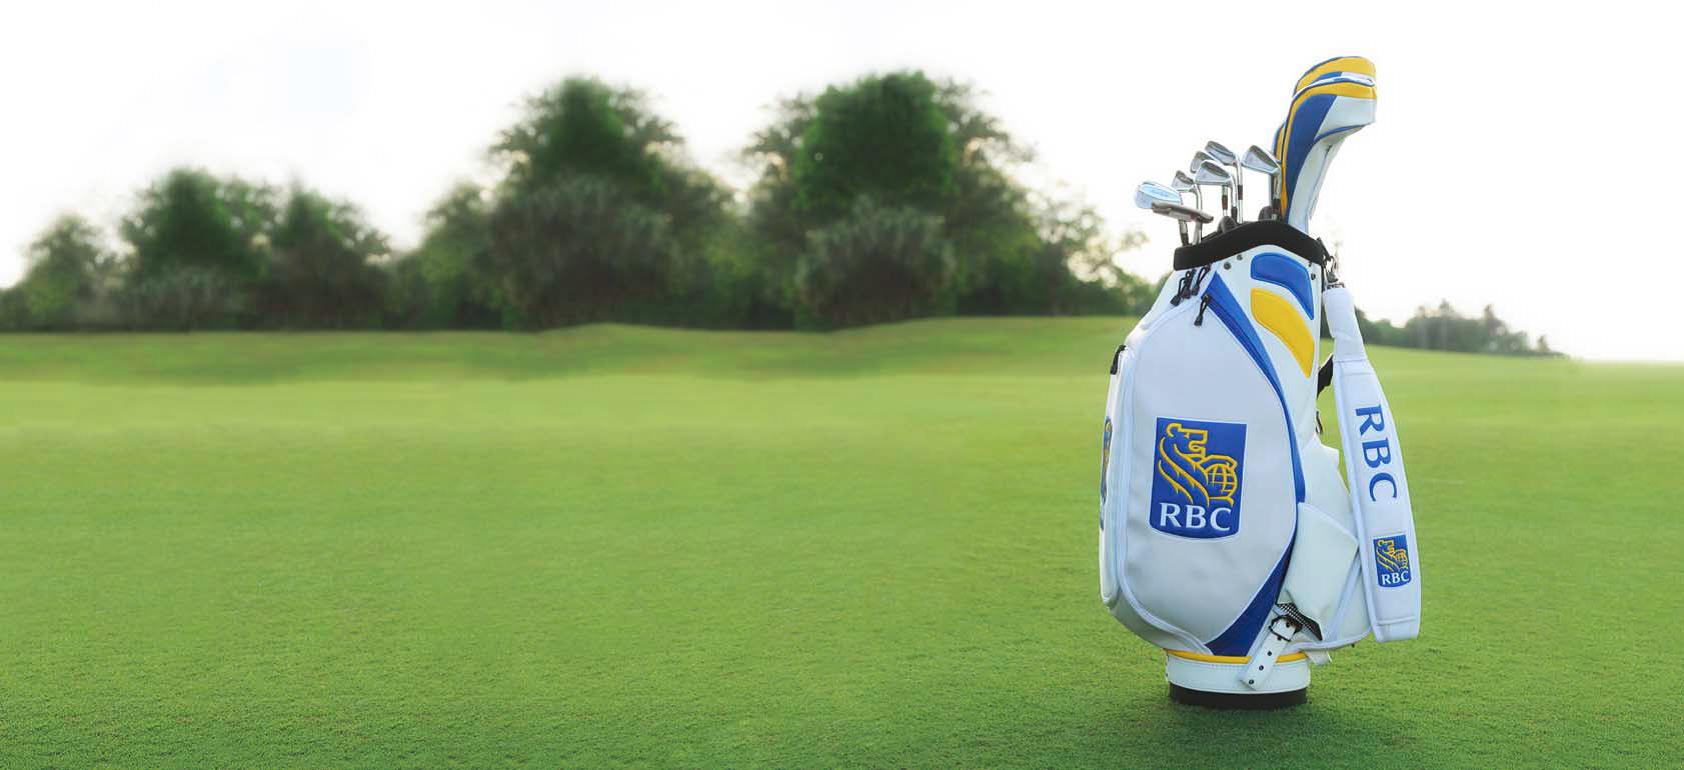 RBC Annual Charity Golf Classic